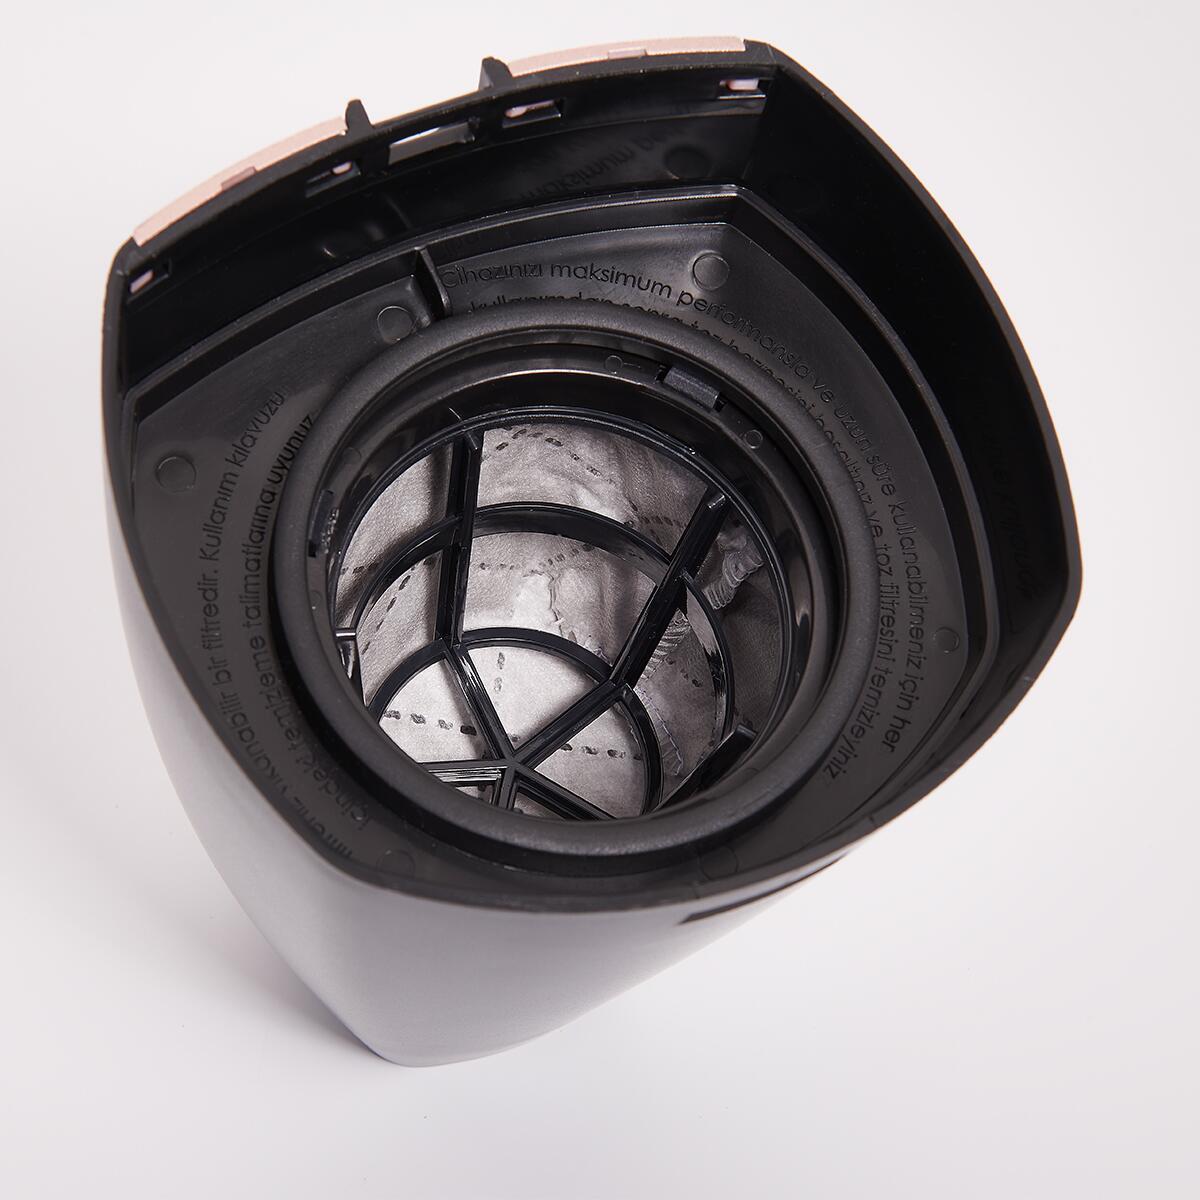 Korkmaz Tempratik Dikey Lavanta/Siyah Elektrikli Süpürge